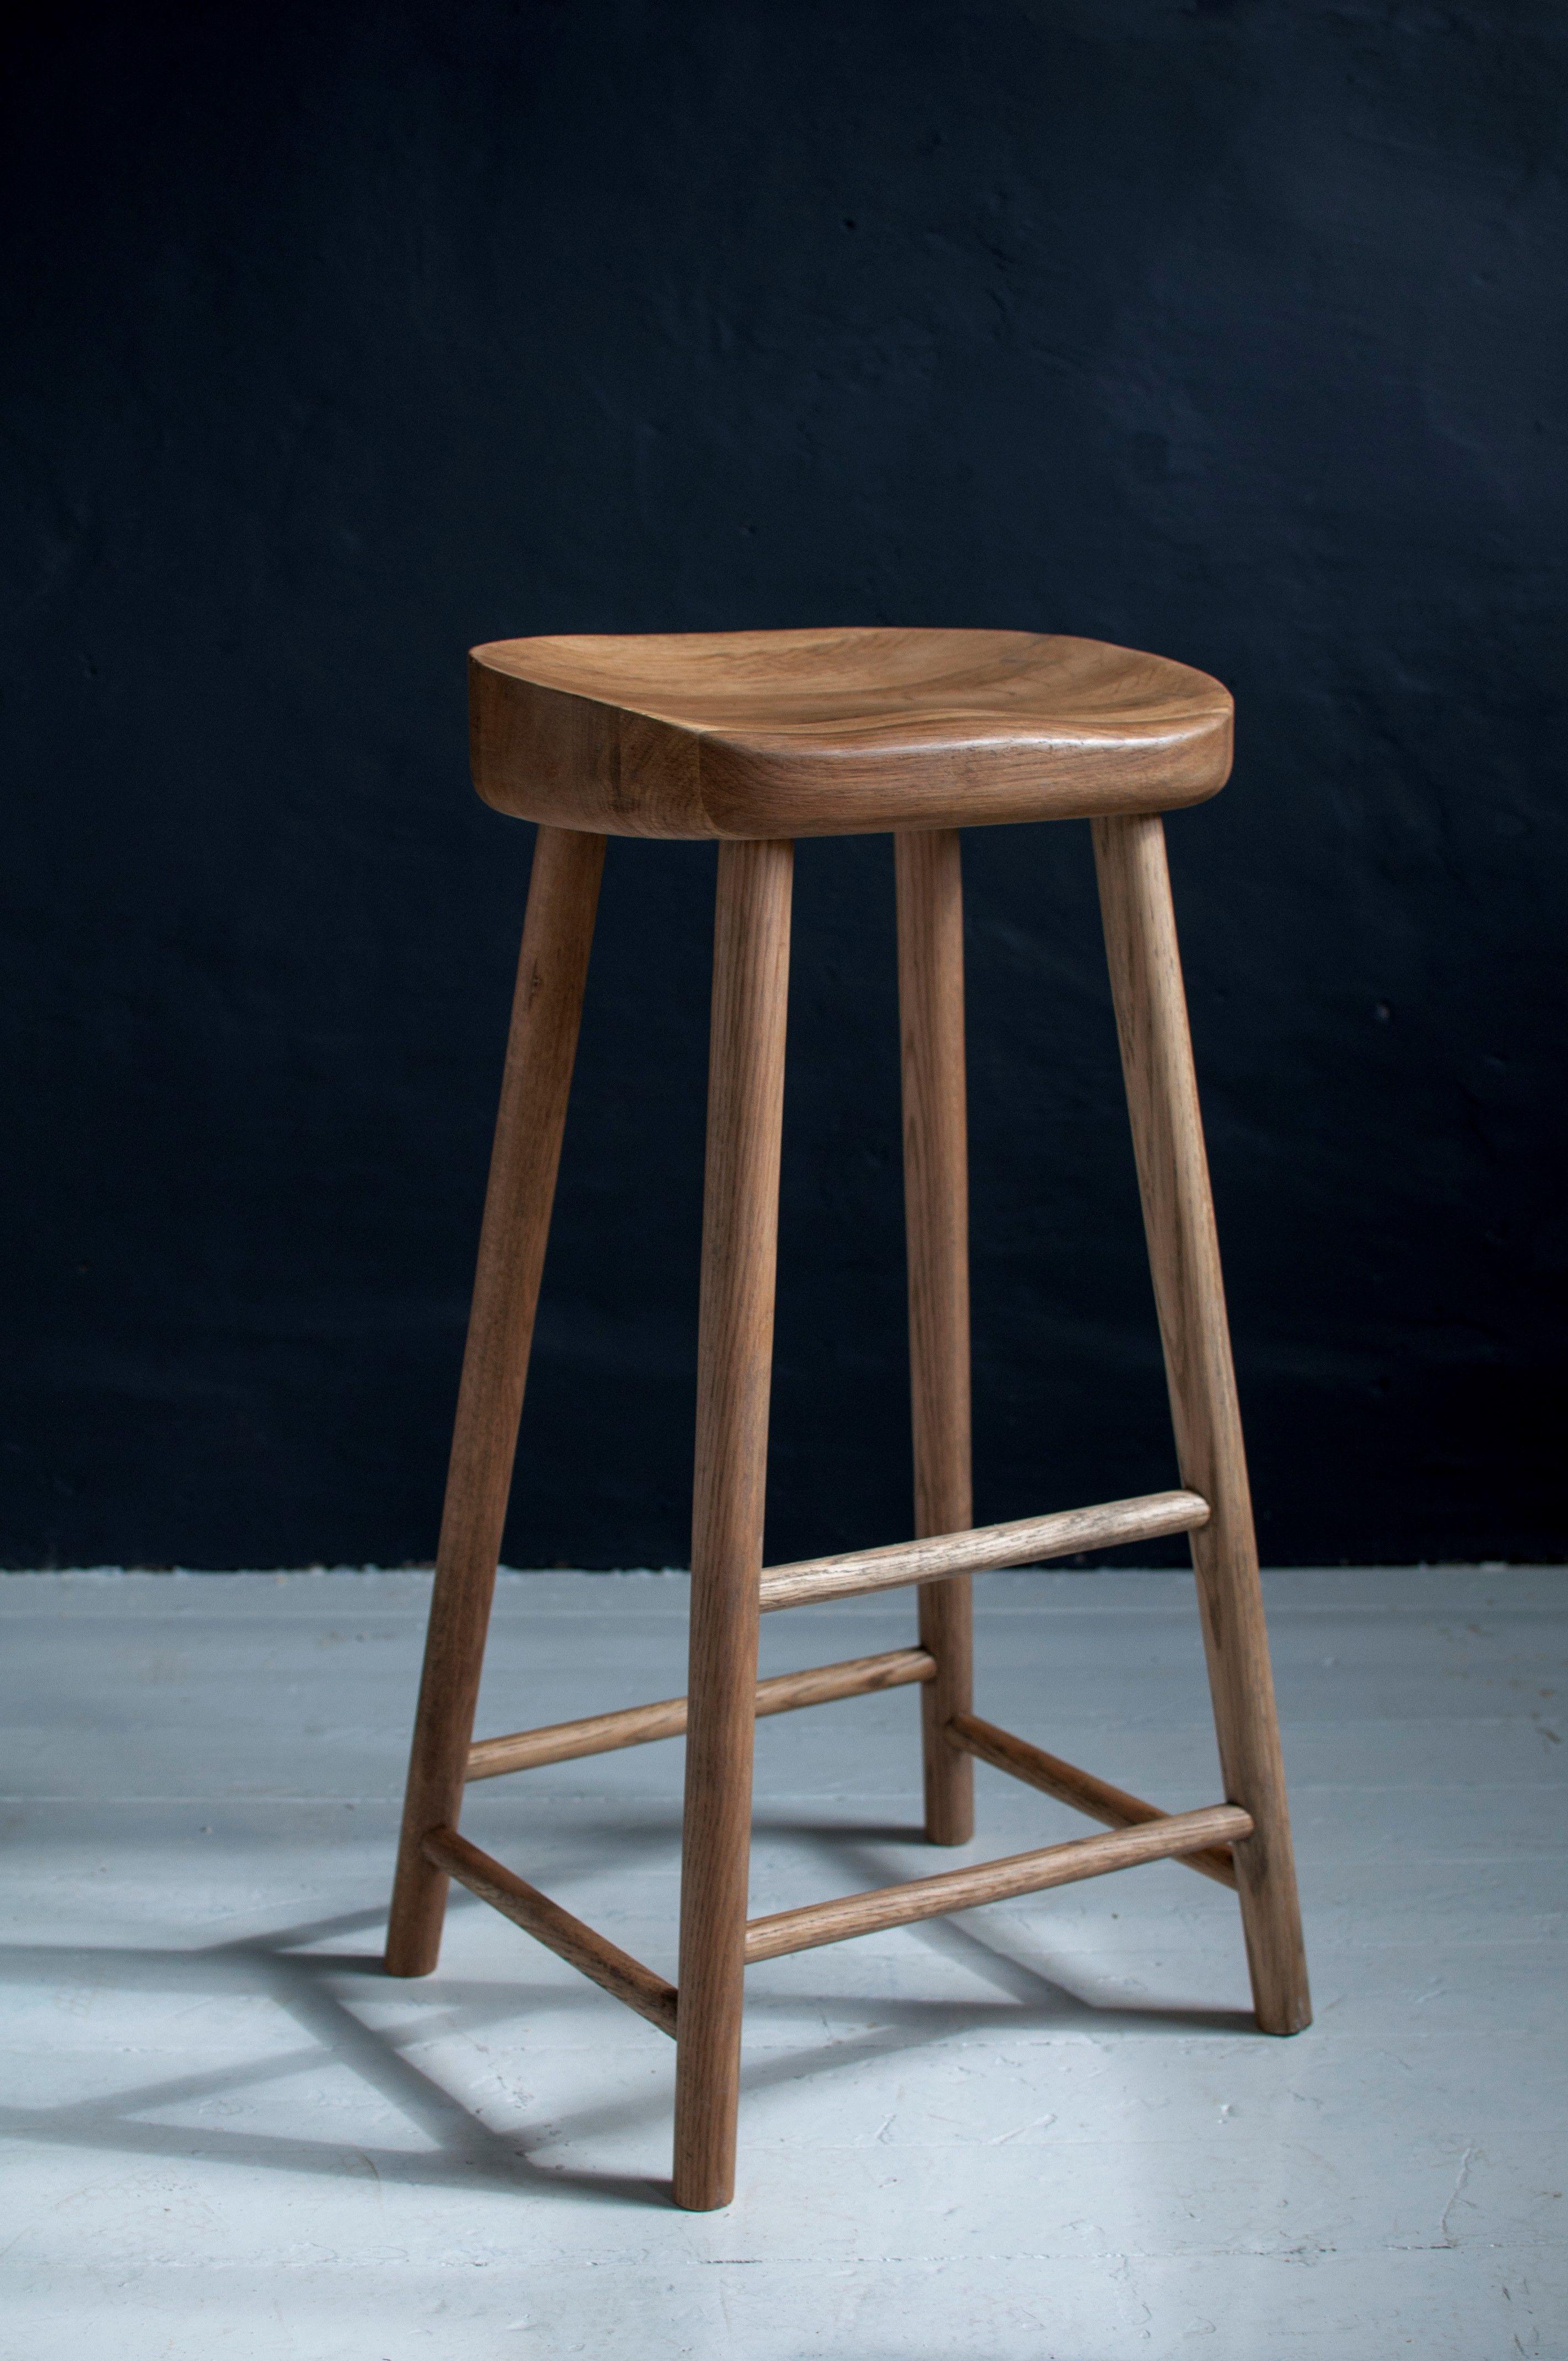 Solid Oak Stool Weathered Oak Bar Stool Breakfast Bar Stool Oak Bar Stools Bar Stools Oak Stool